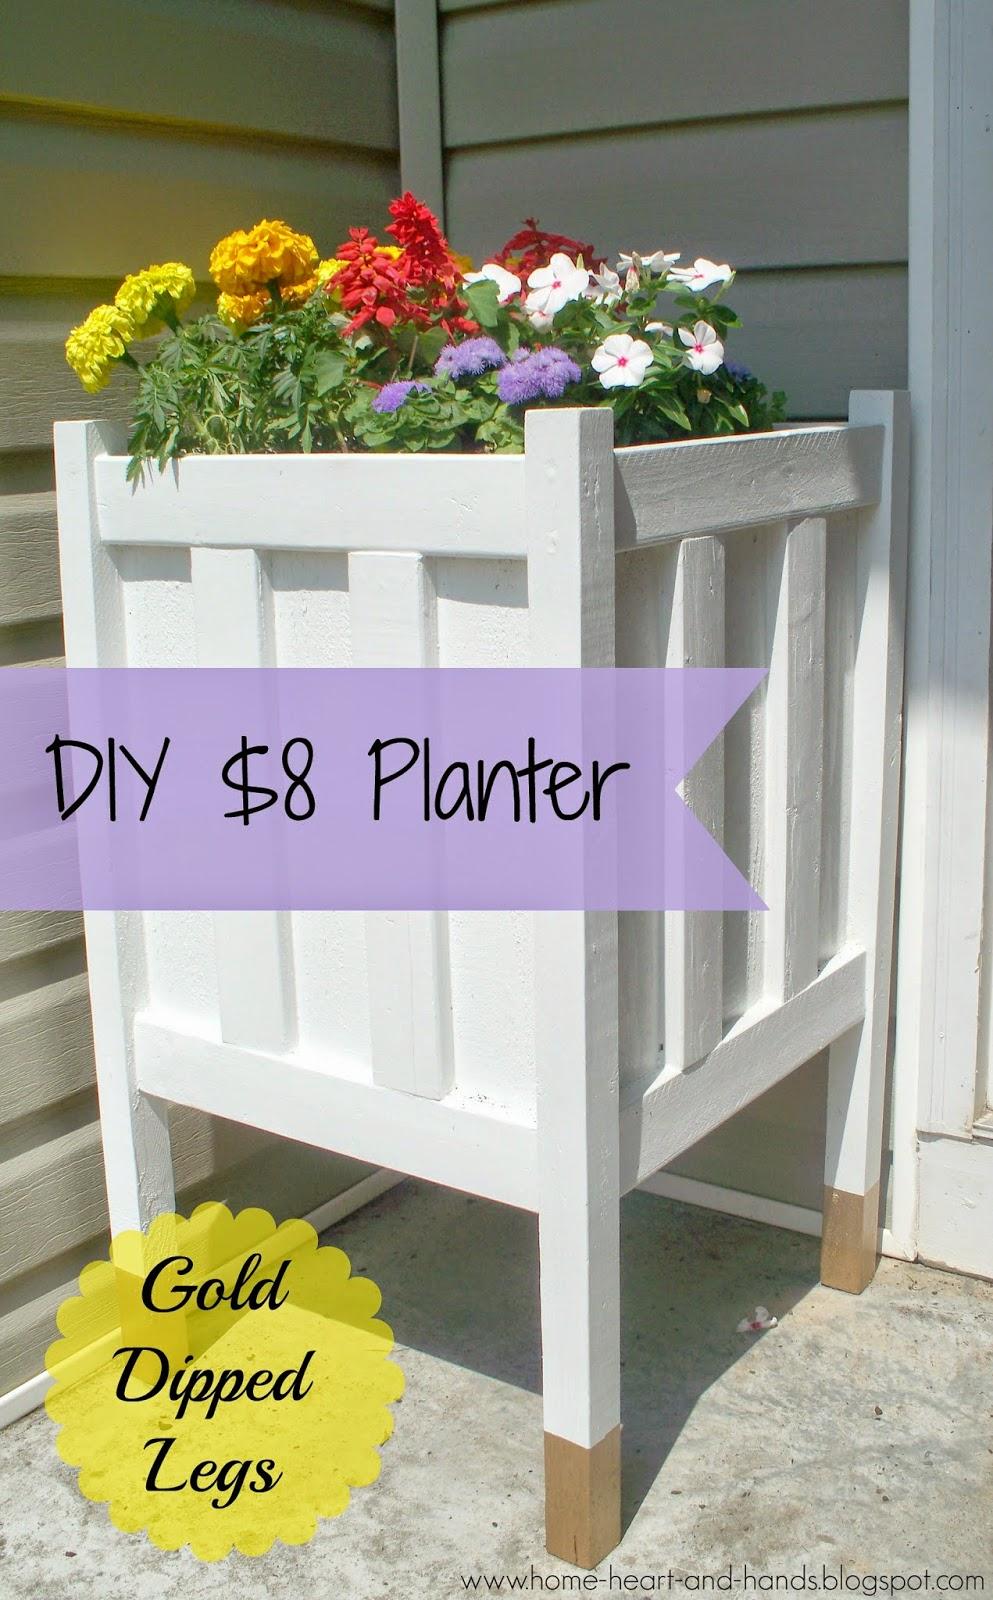 11 Decorate the Planters Personally Simphome com